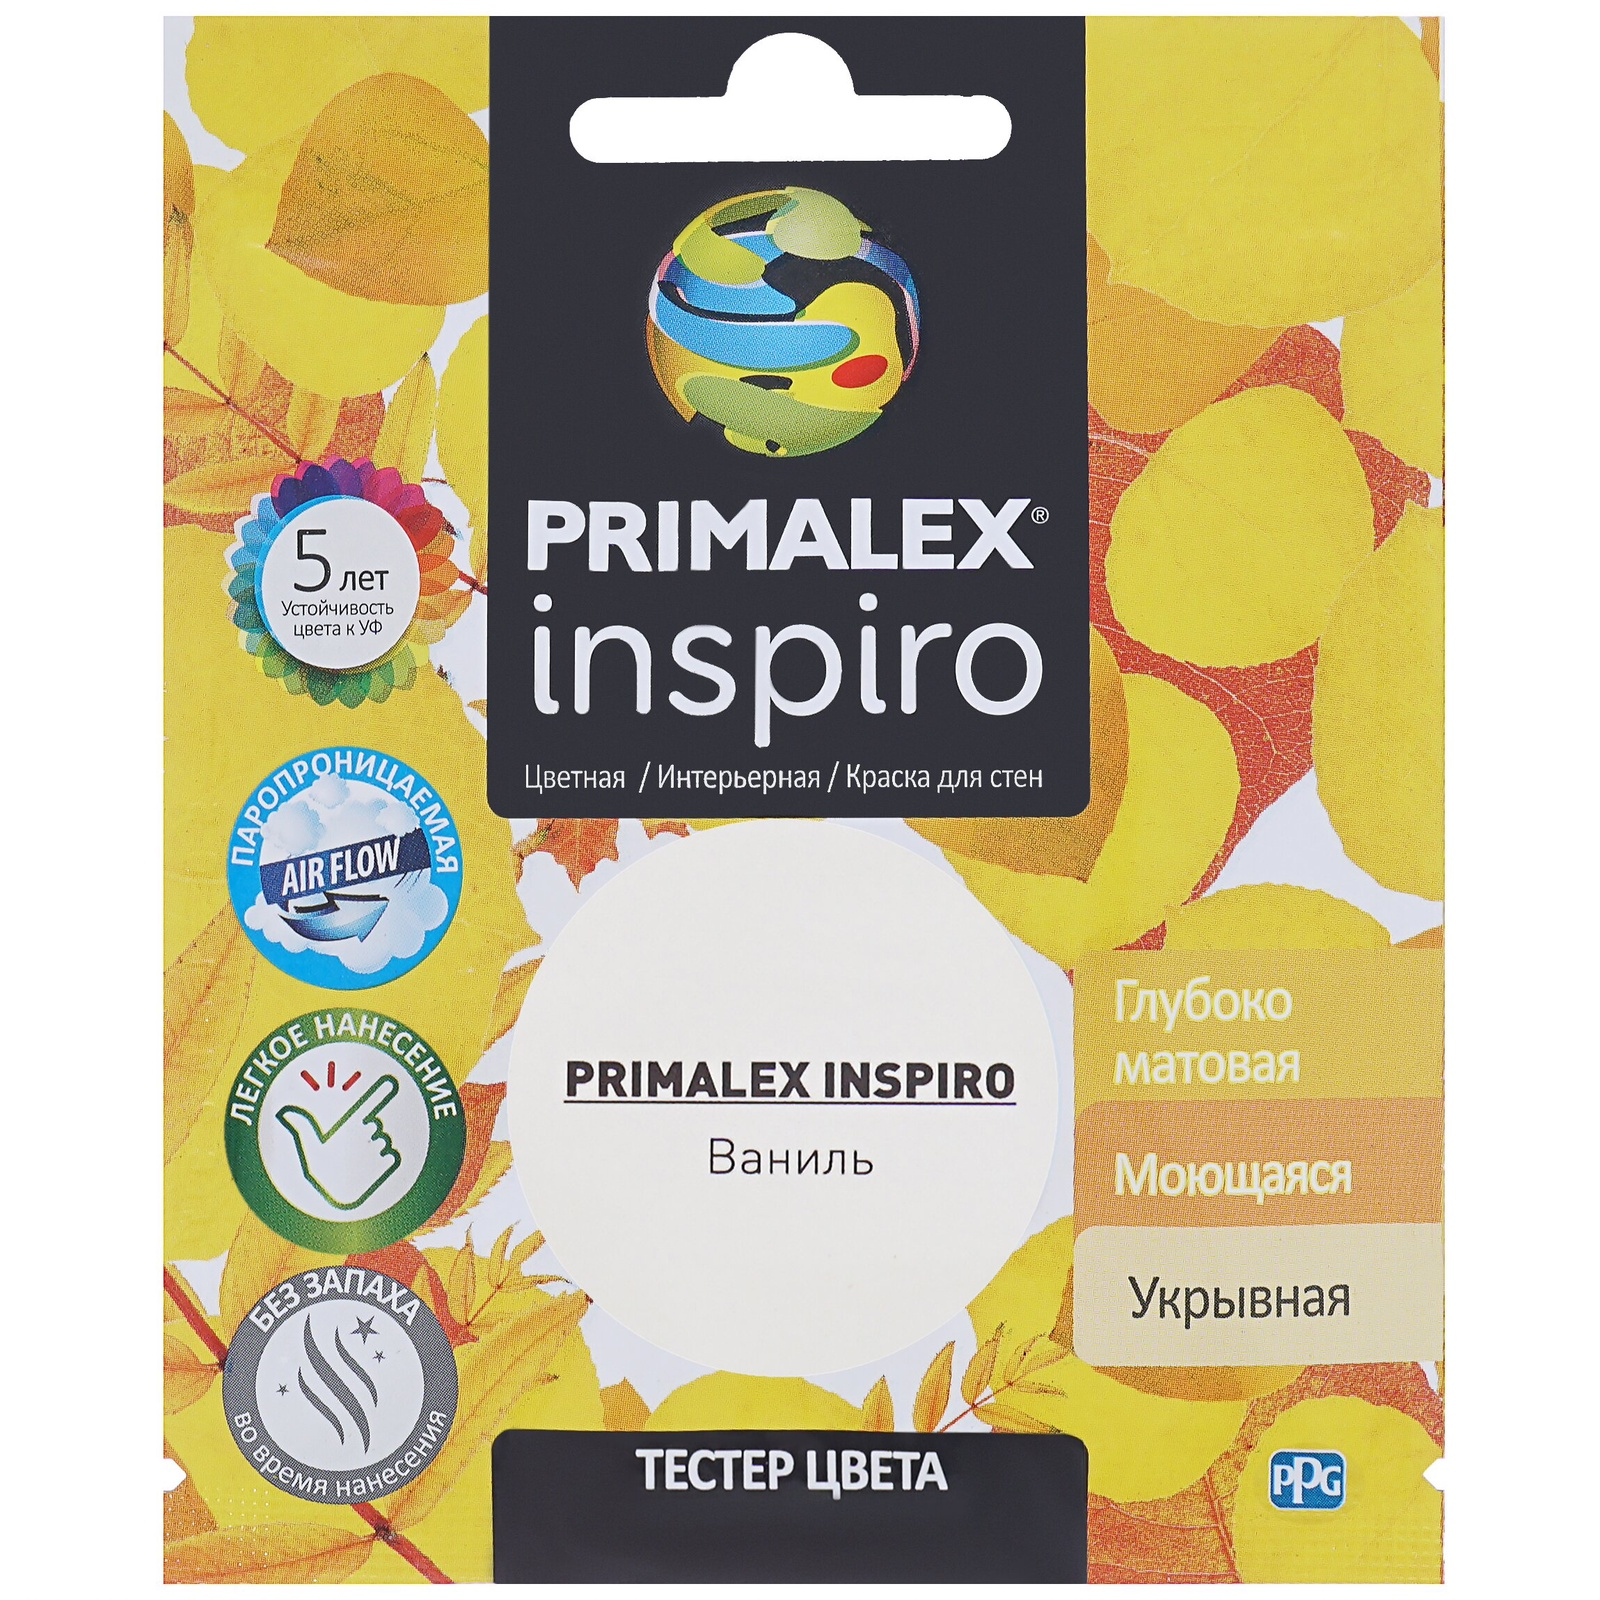 Краска PPG Primalex Inspiro Ваниль 40мл краска ppg primalex inspiro красный мак 40мл pmx i47